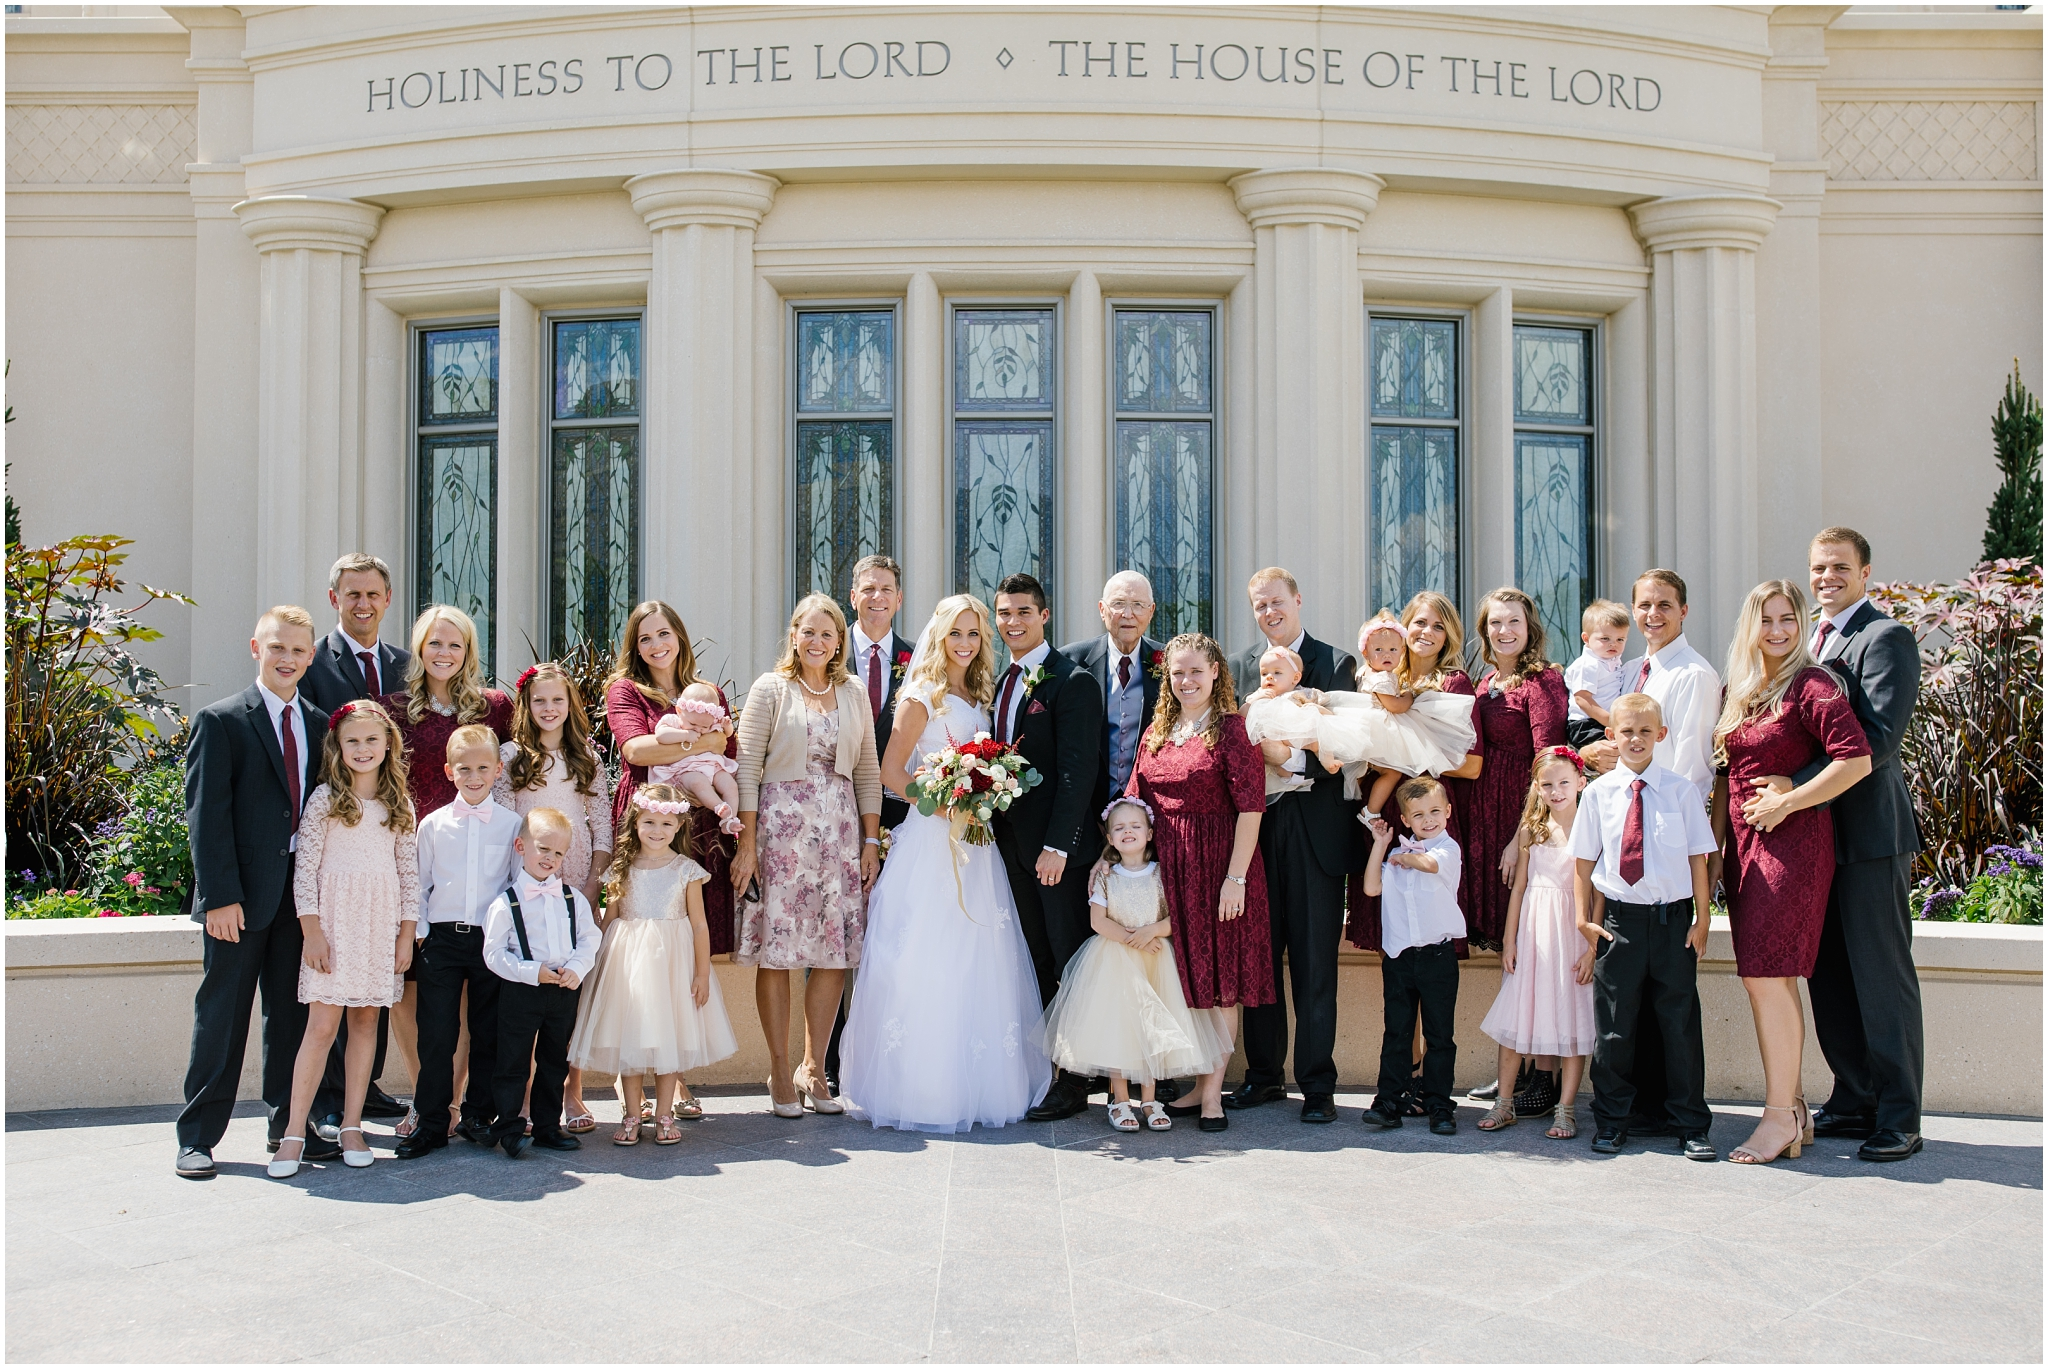 HannahChaseWedding-35_Lizzie-B-Imagery-Utah-Wedding-Photographer-Park-City-Salt-Lake-City-Payson-Temple-Clarion-Garden-Center.jpg